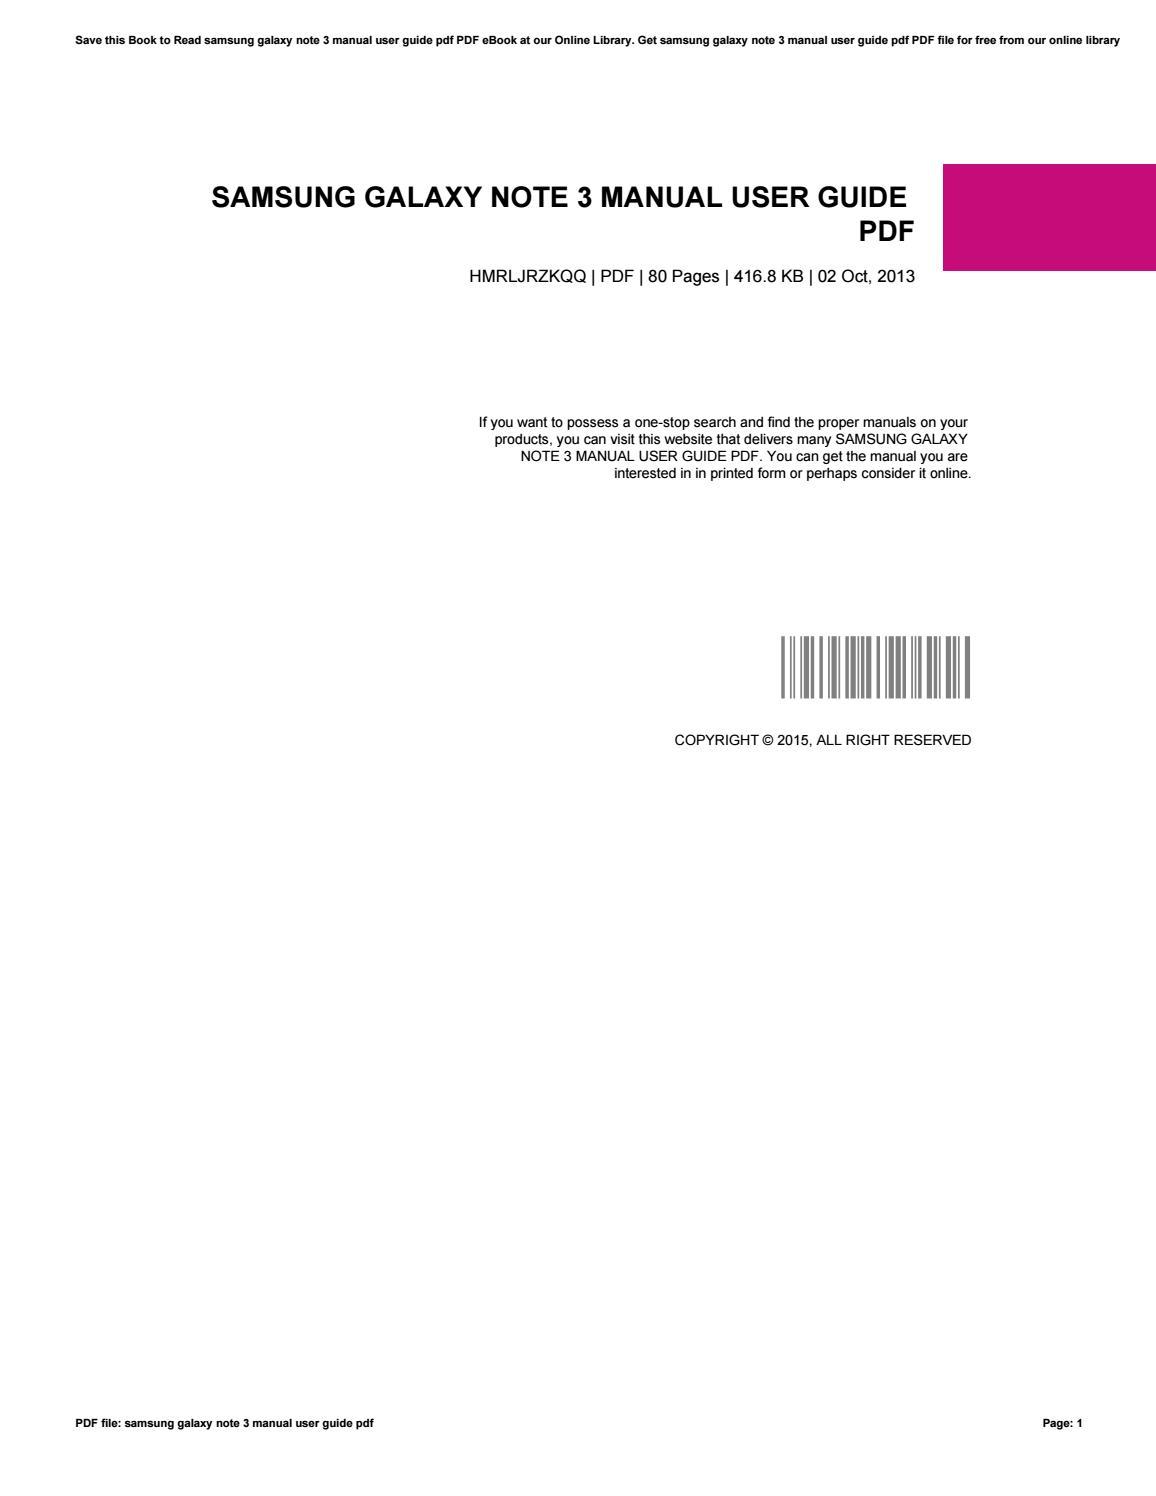 samsung galaxy note 3 manual user guide pdf by zafiqra45asmari issuu rh issuu com advanced get user manual git manual merge file